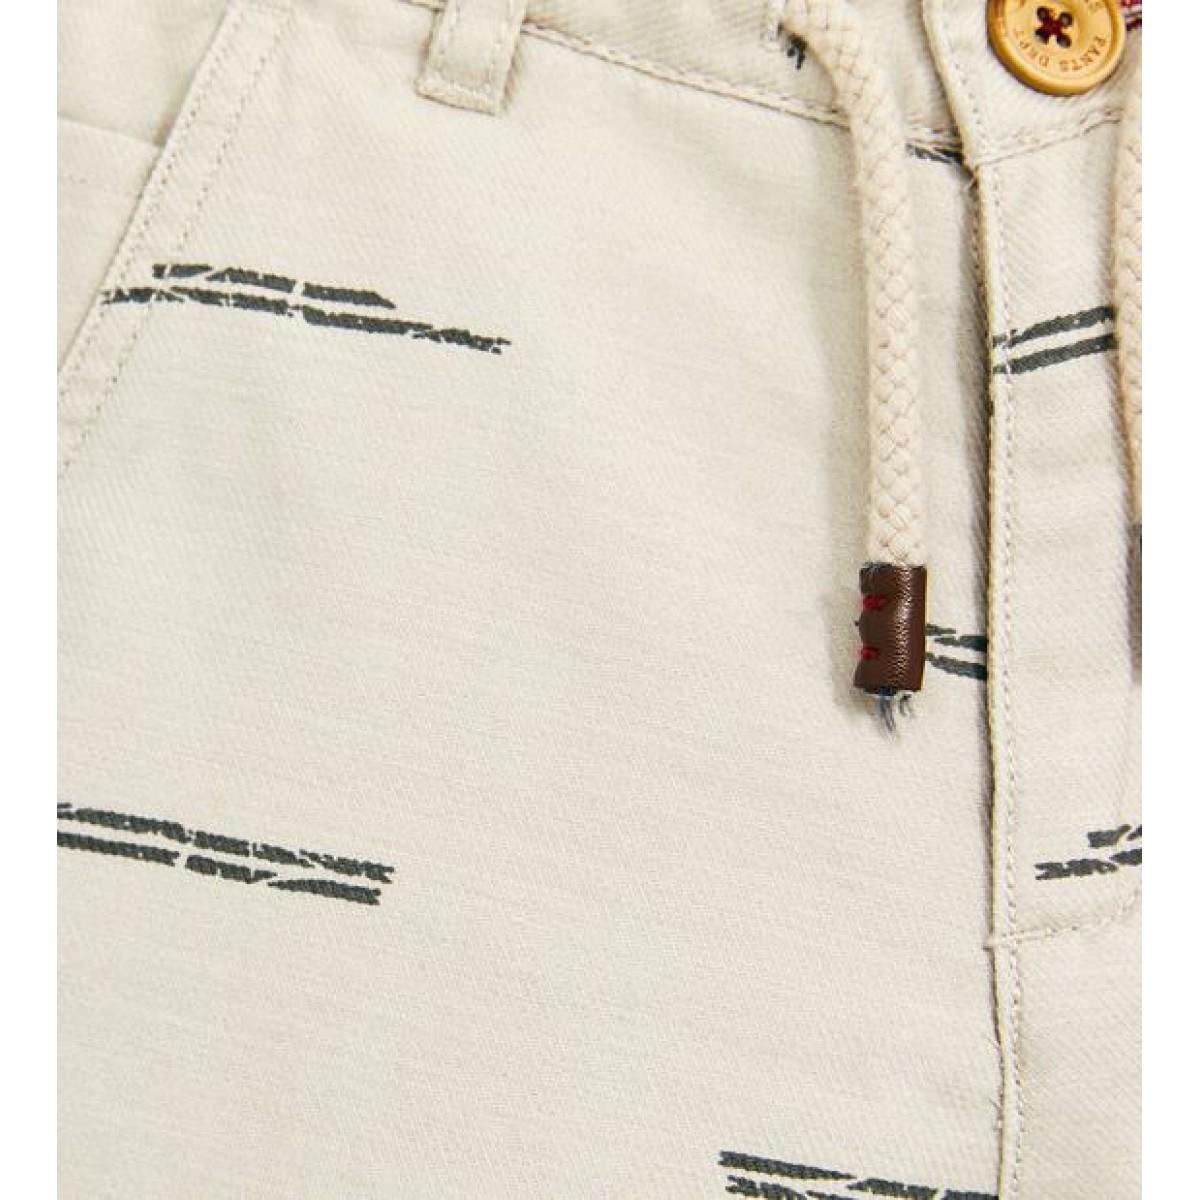 Zara Printed Bermuda Shorts